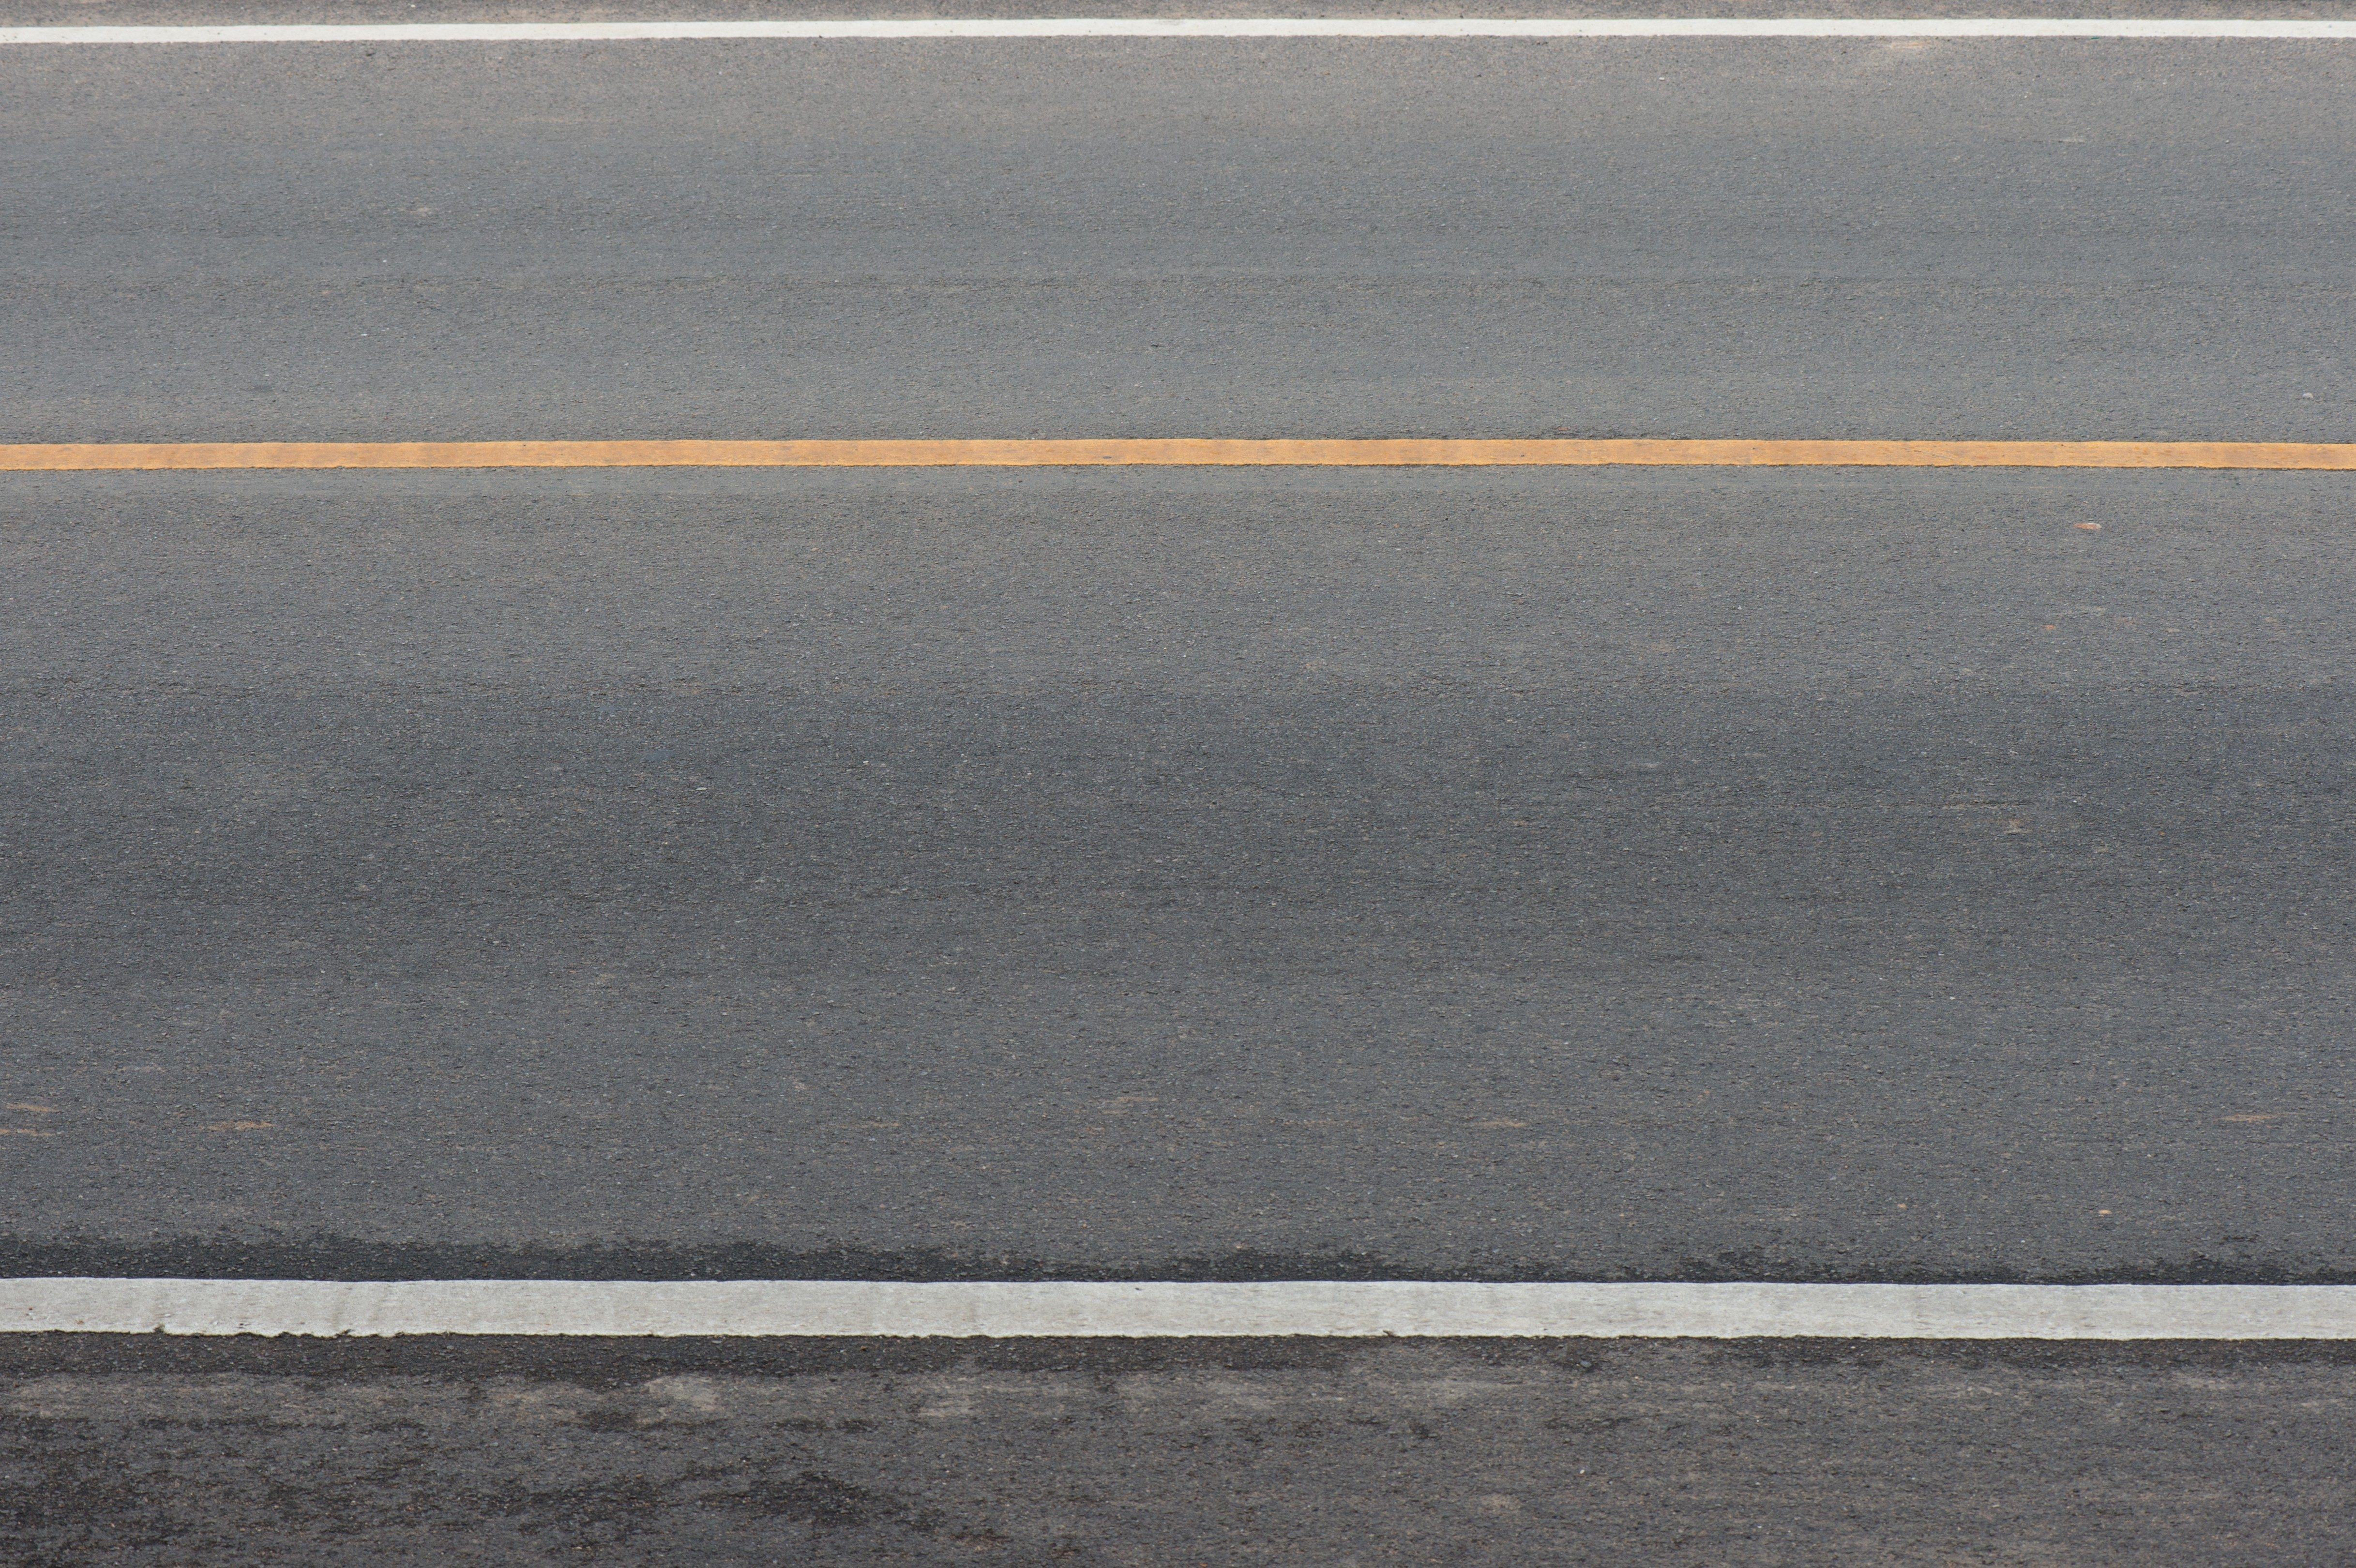 asphalt road texture background with line